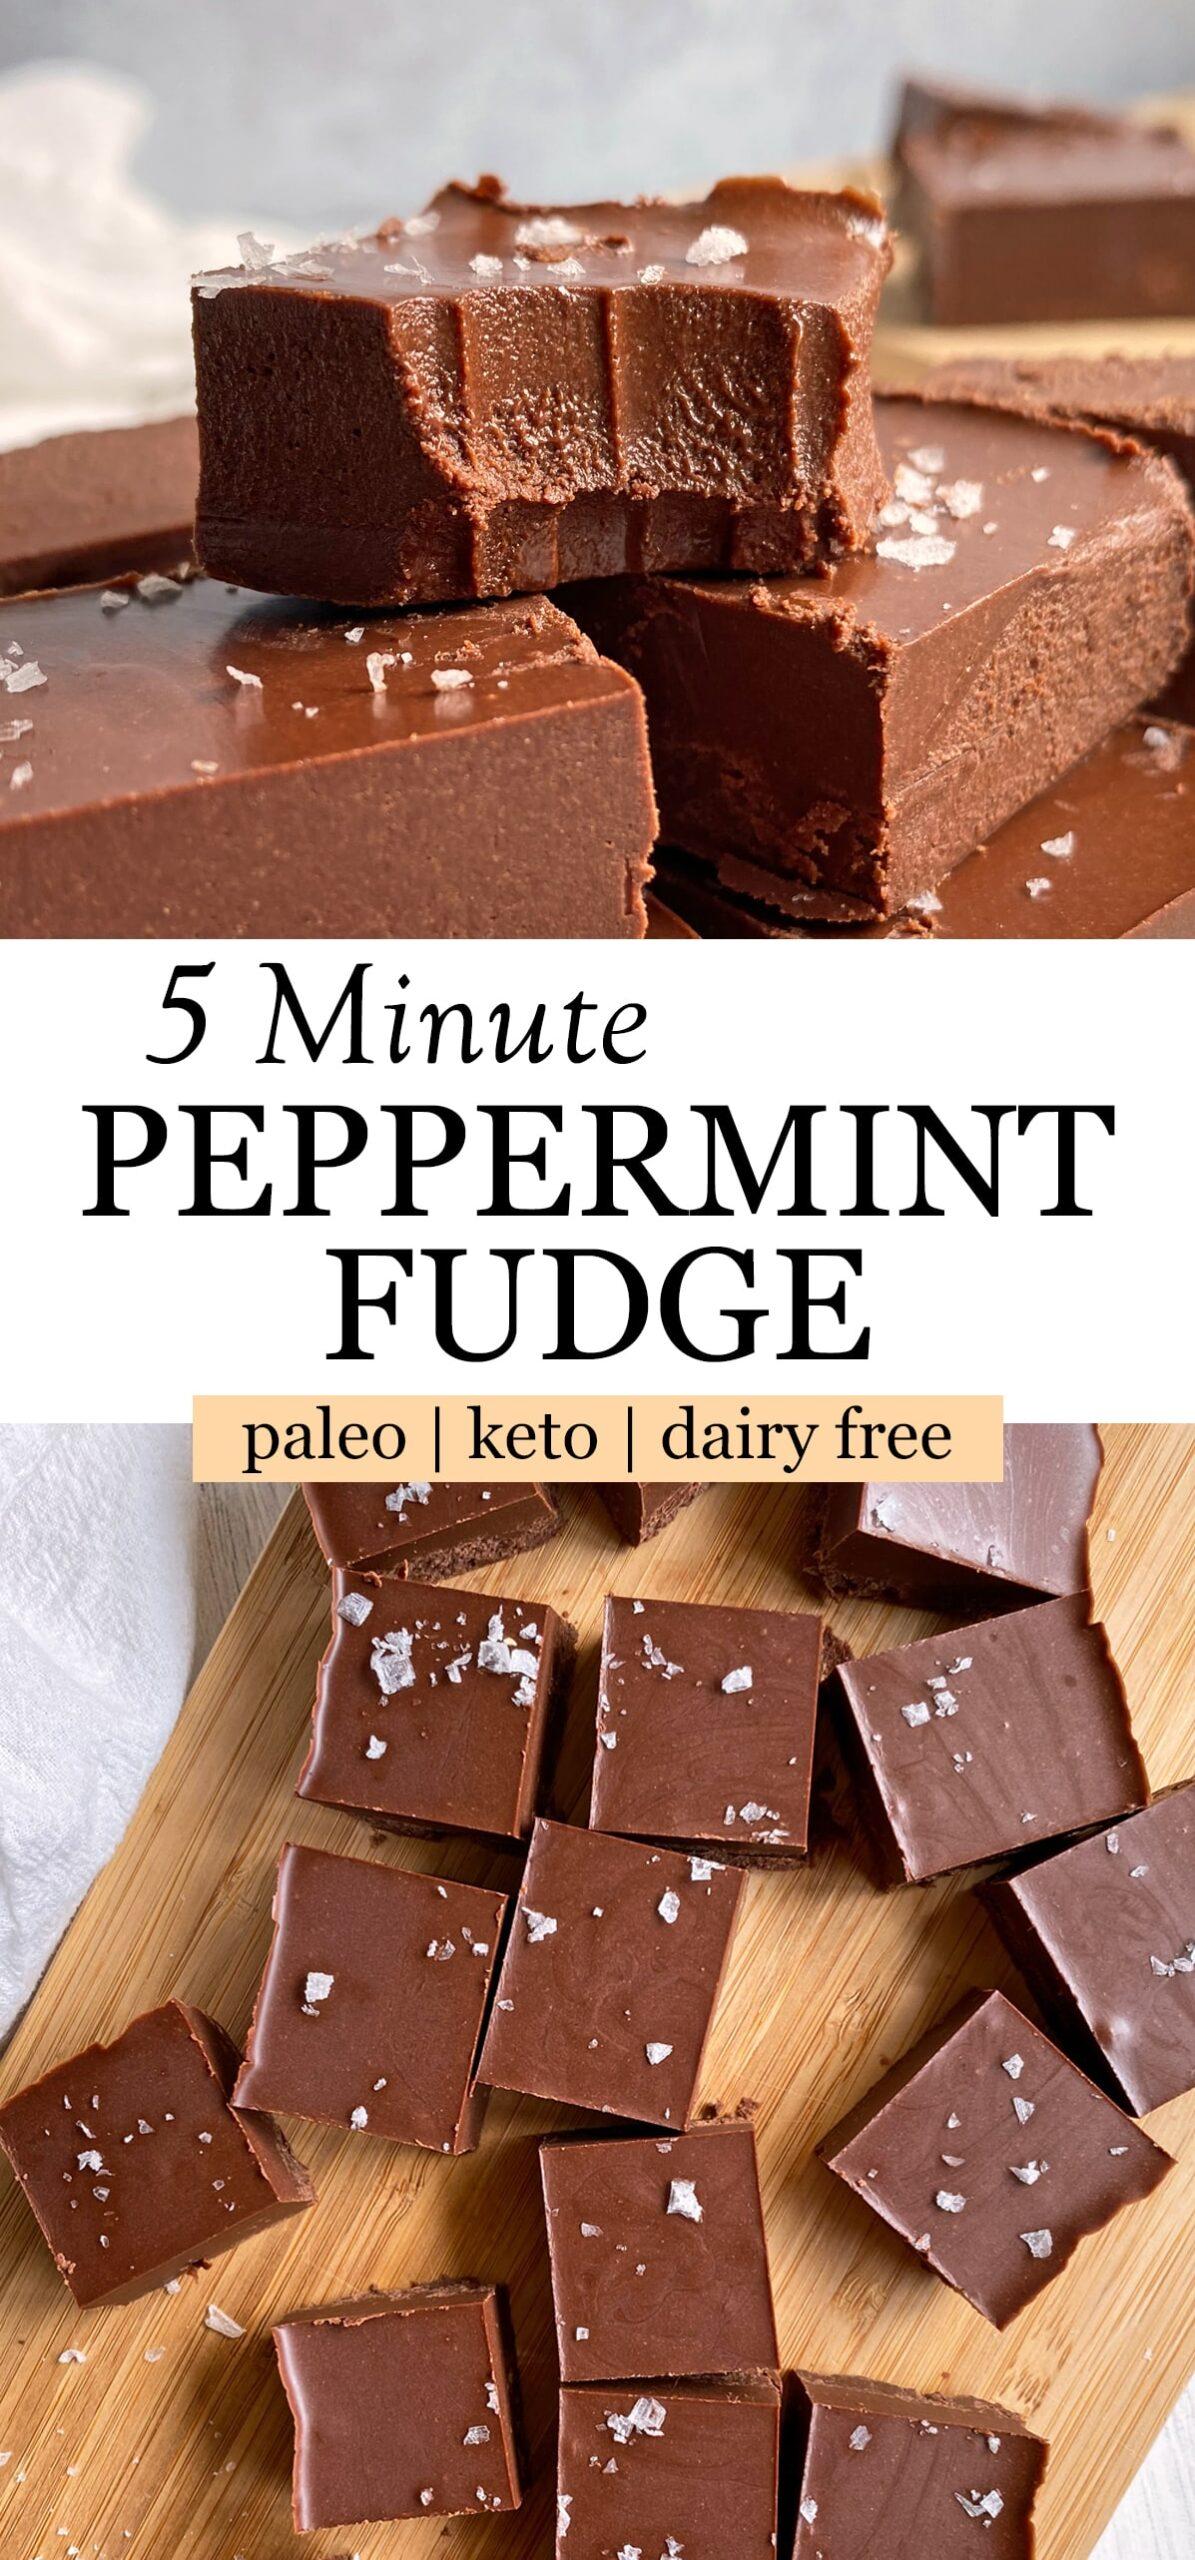 peppermint fudge pinterest image